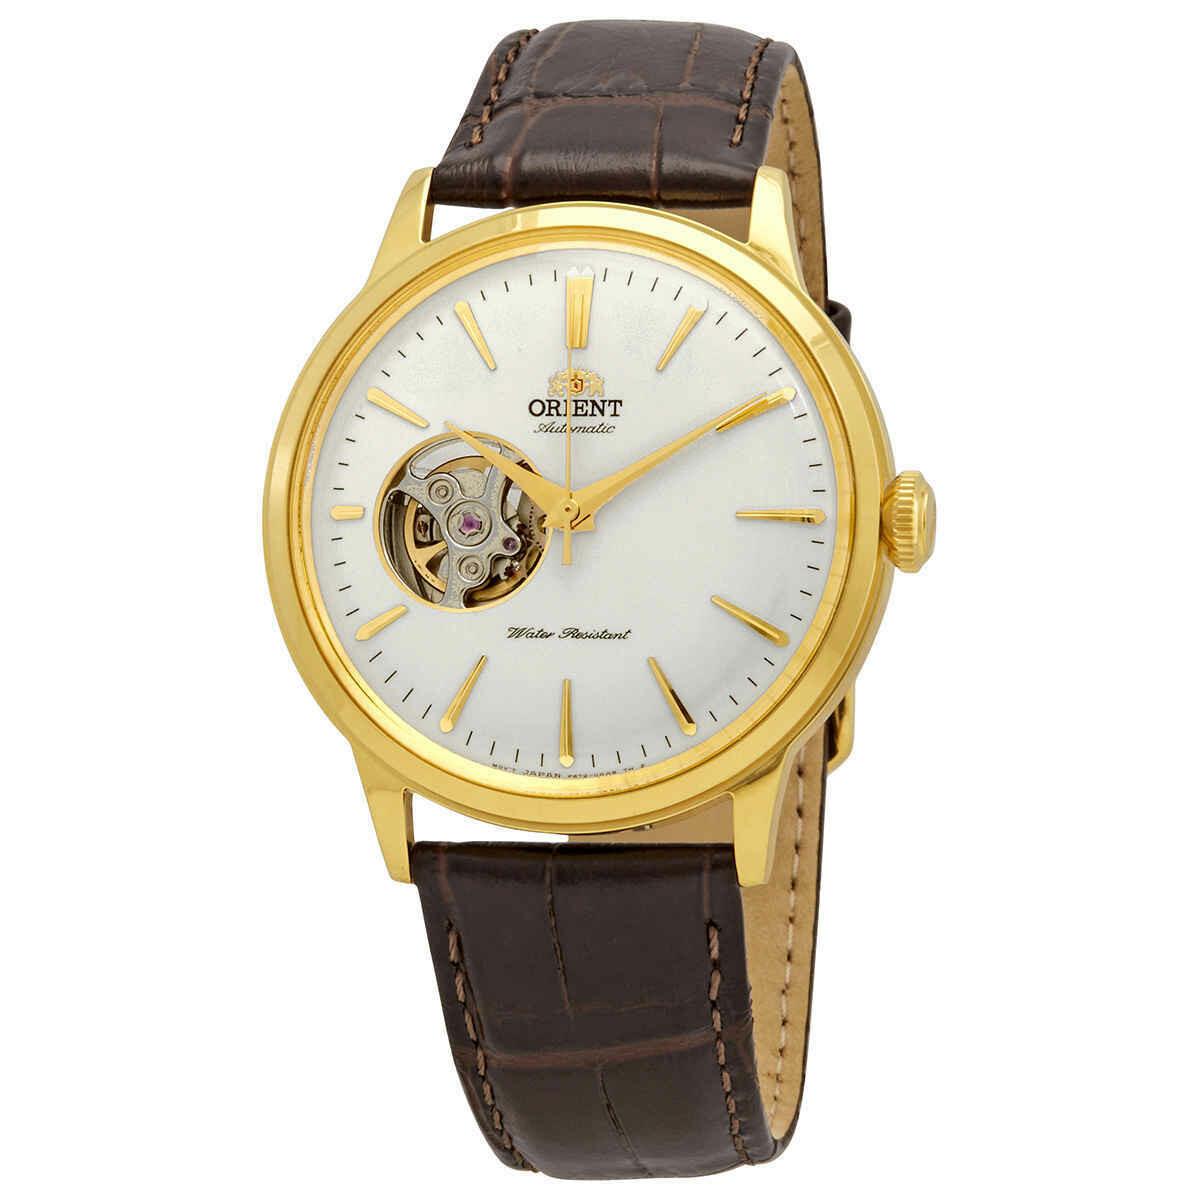 Reloj Automático hombre Orient Bambino RA-AG0003S Open Heart correa cuero oro rosa